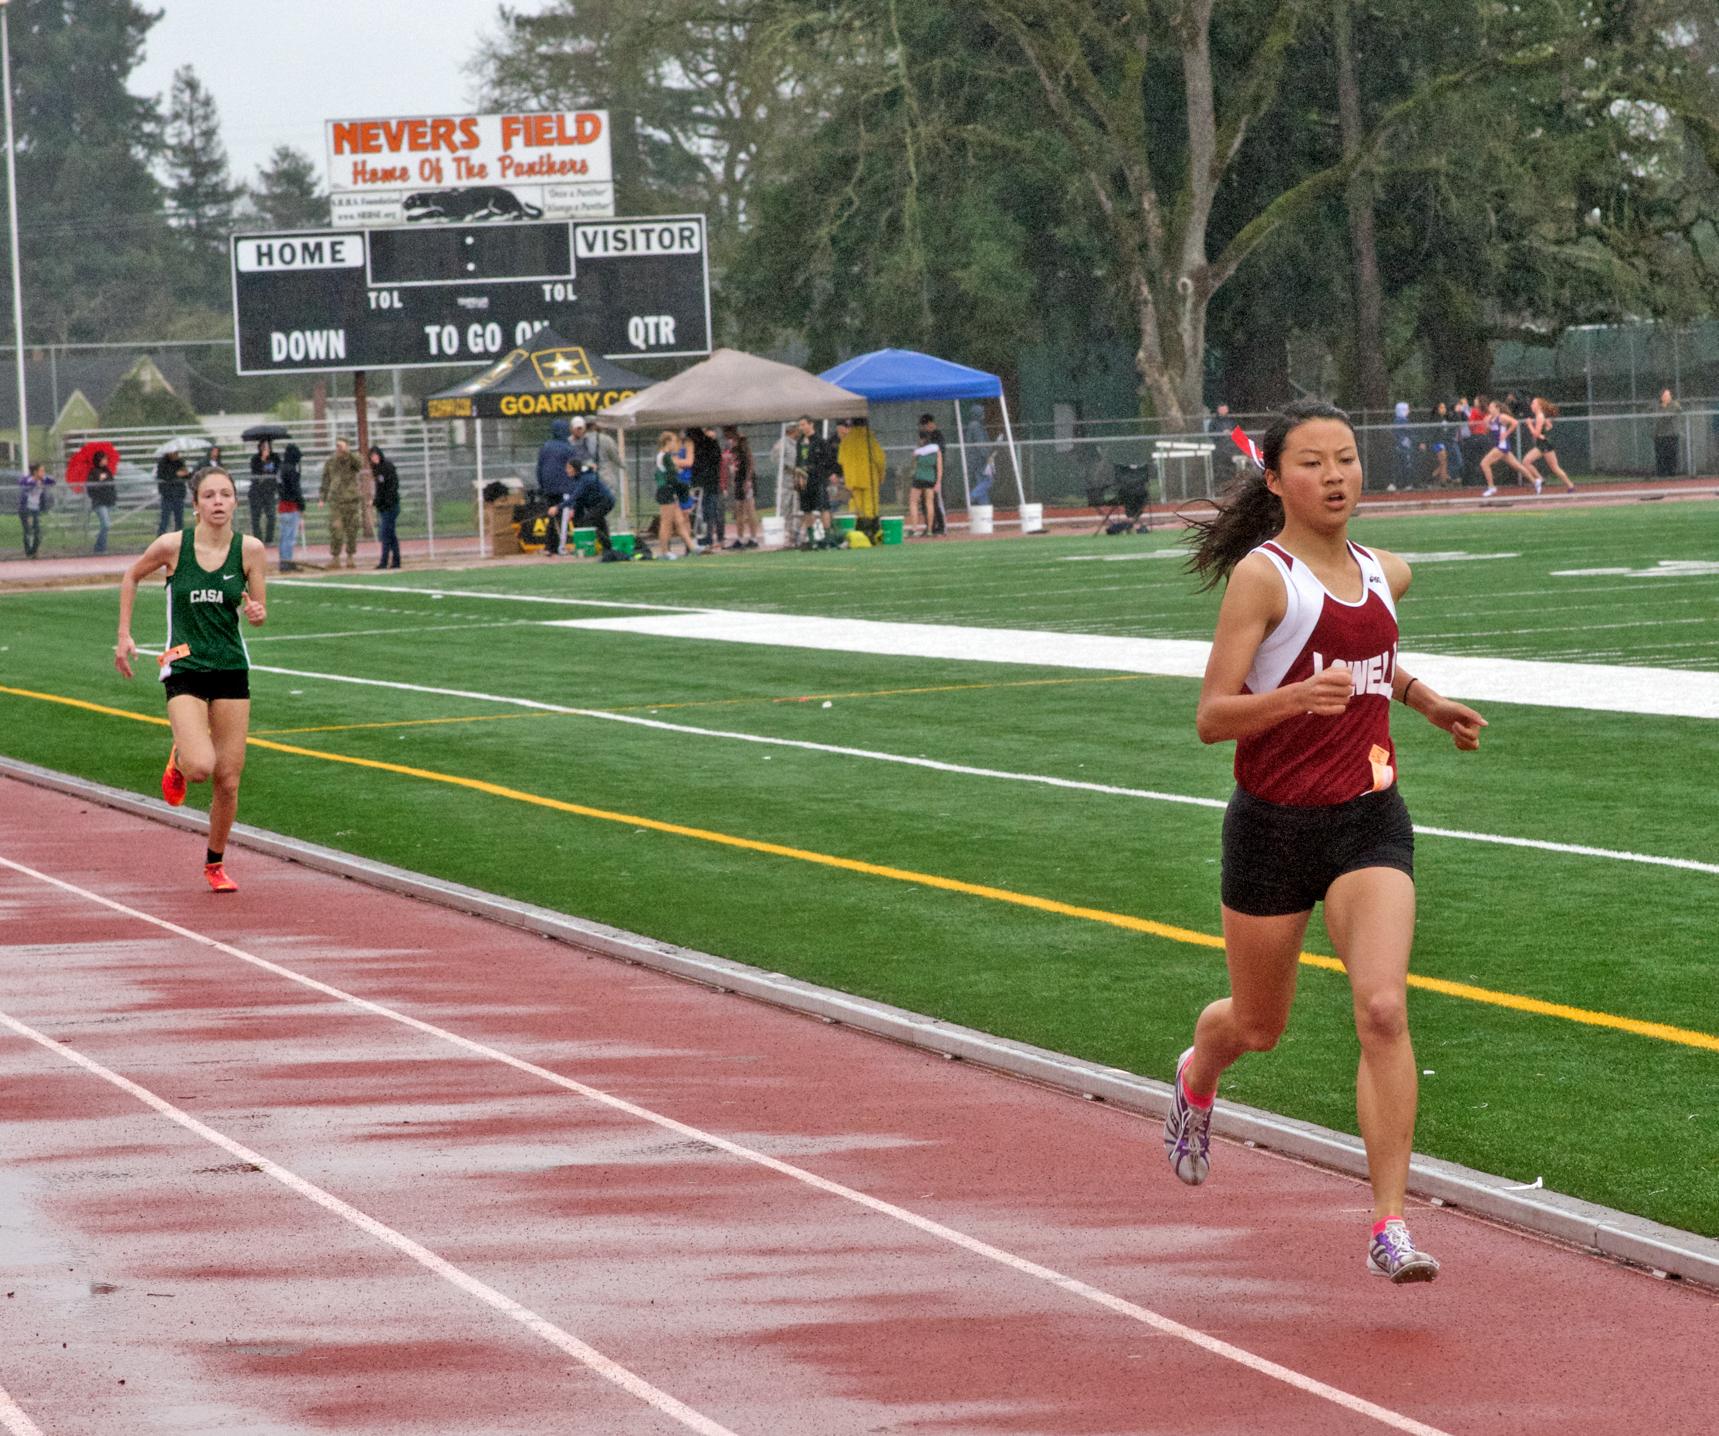 Varsity Girls 1600 winner of Final Heat, Lowell's Kristen Leung